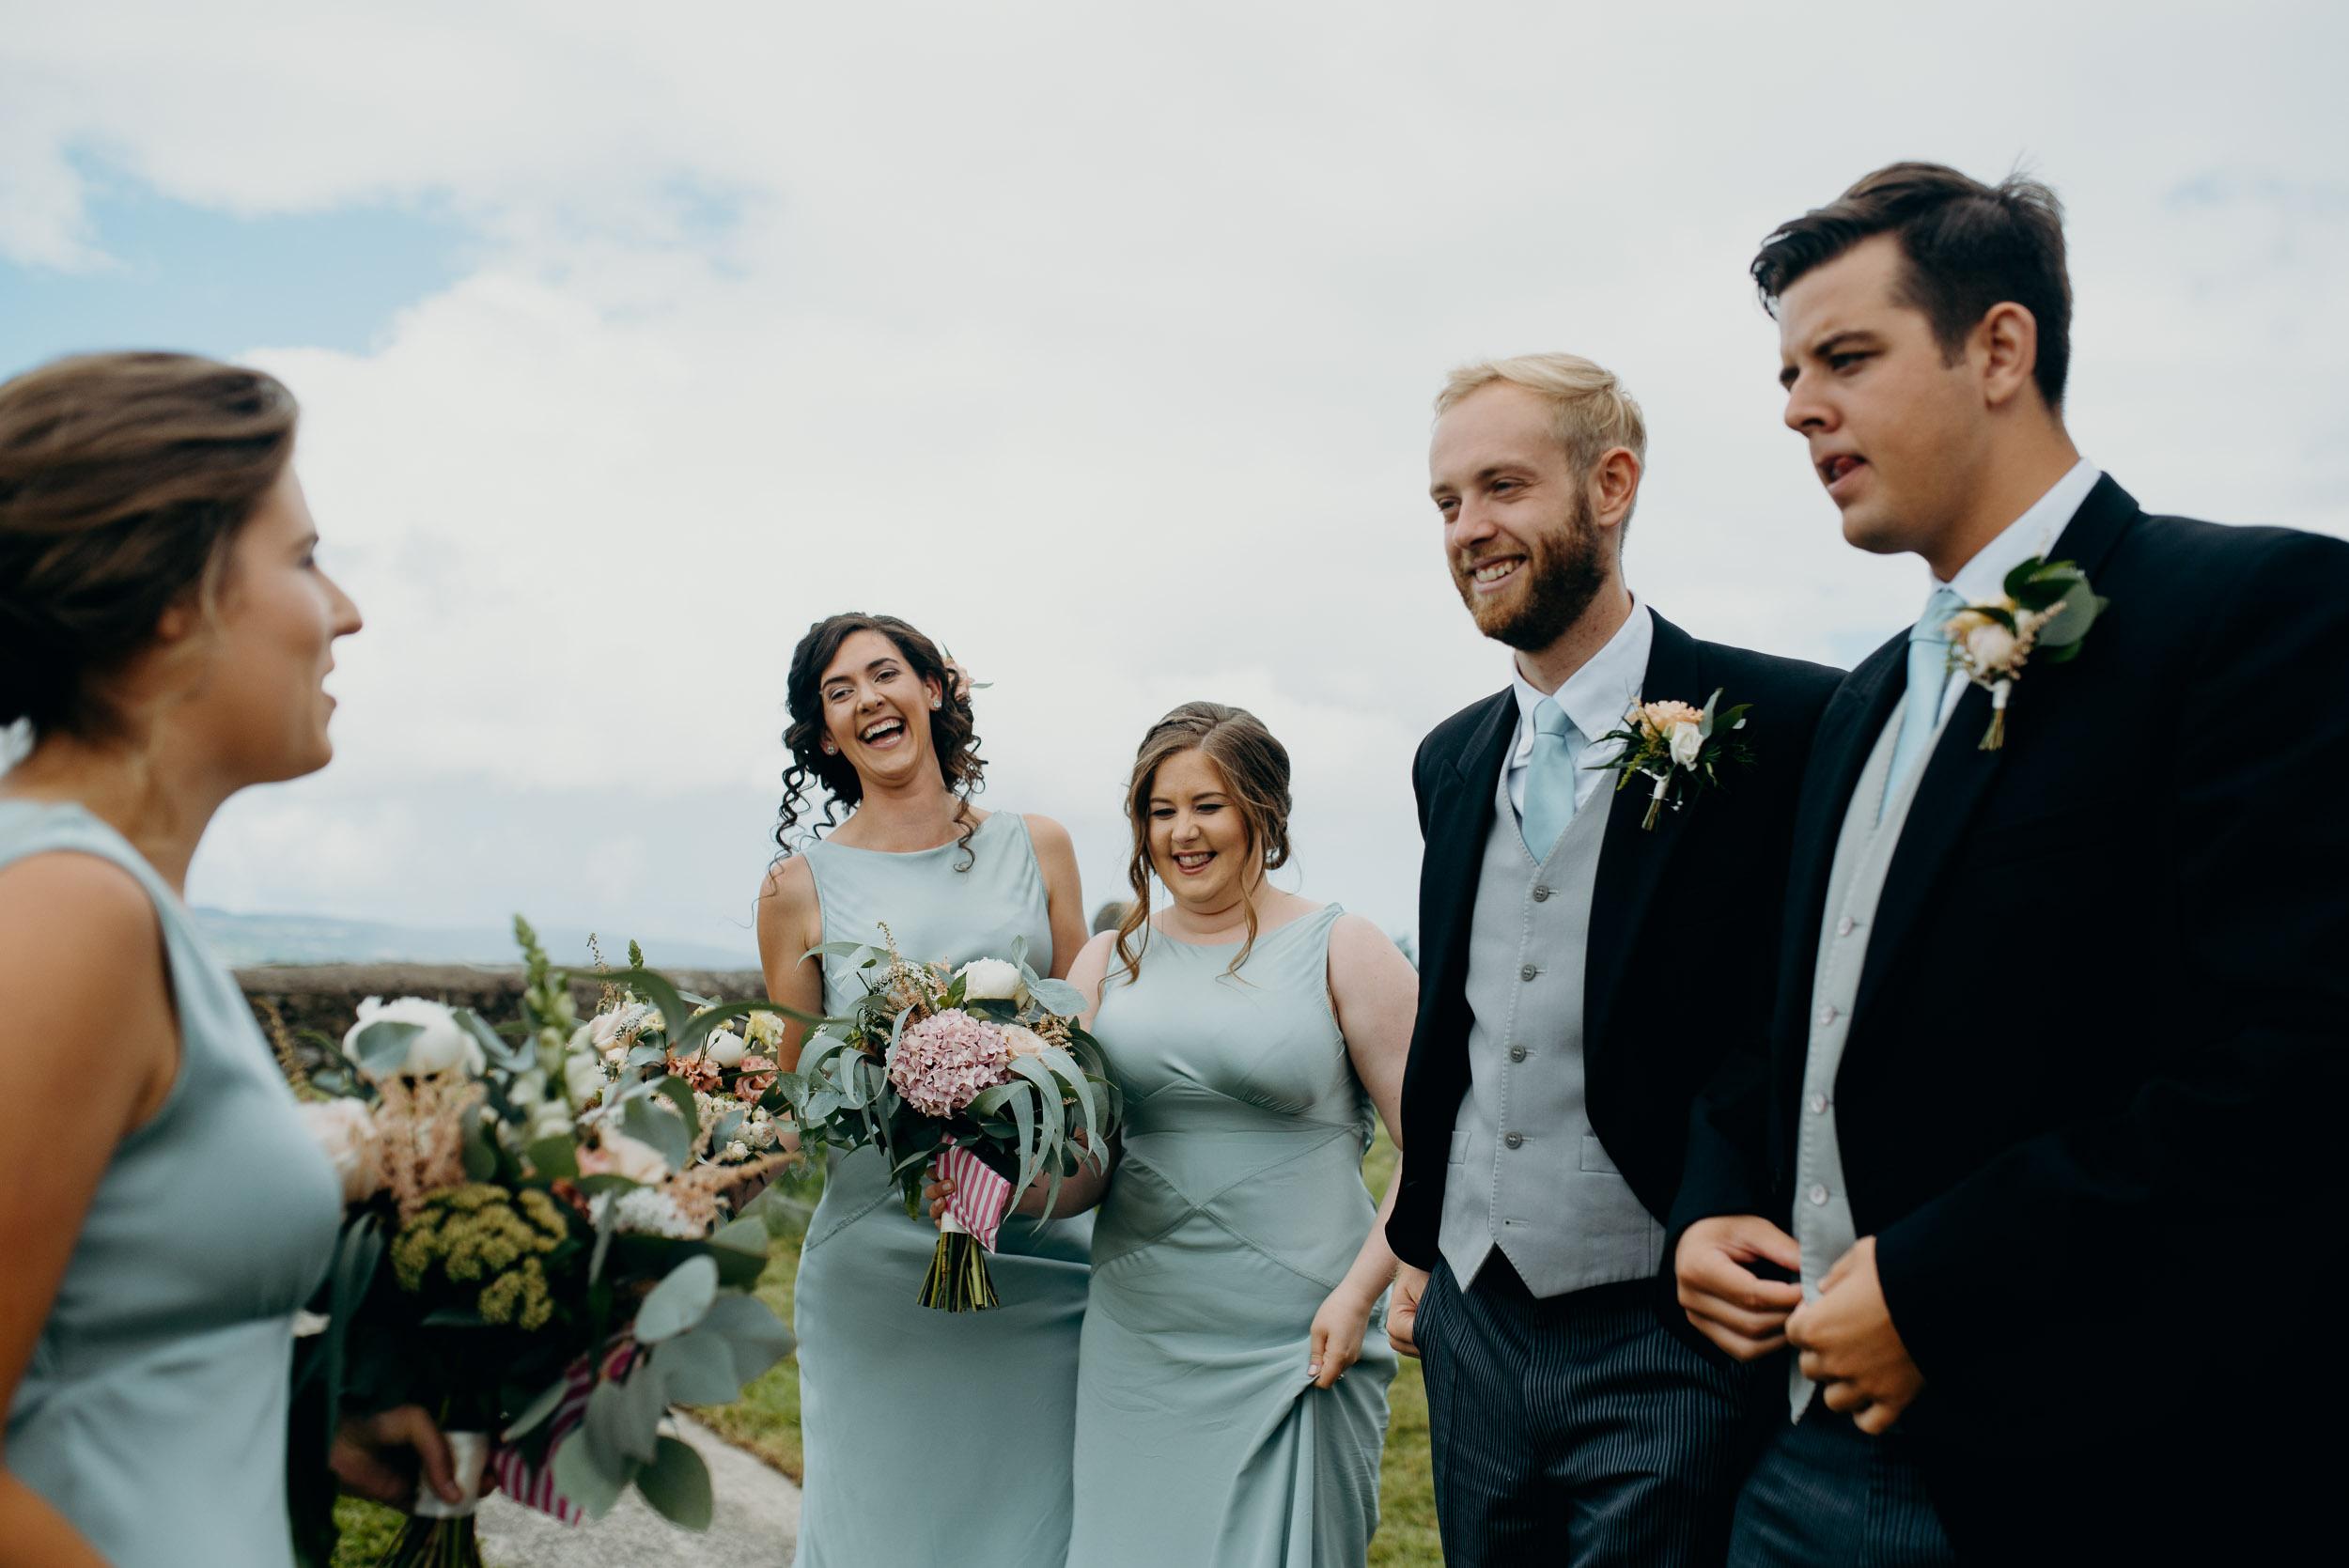 drenagh estate wedding photography-58.jpg